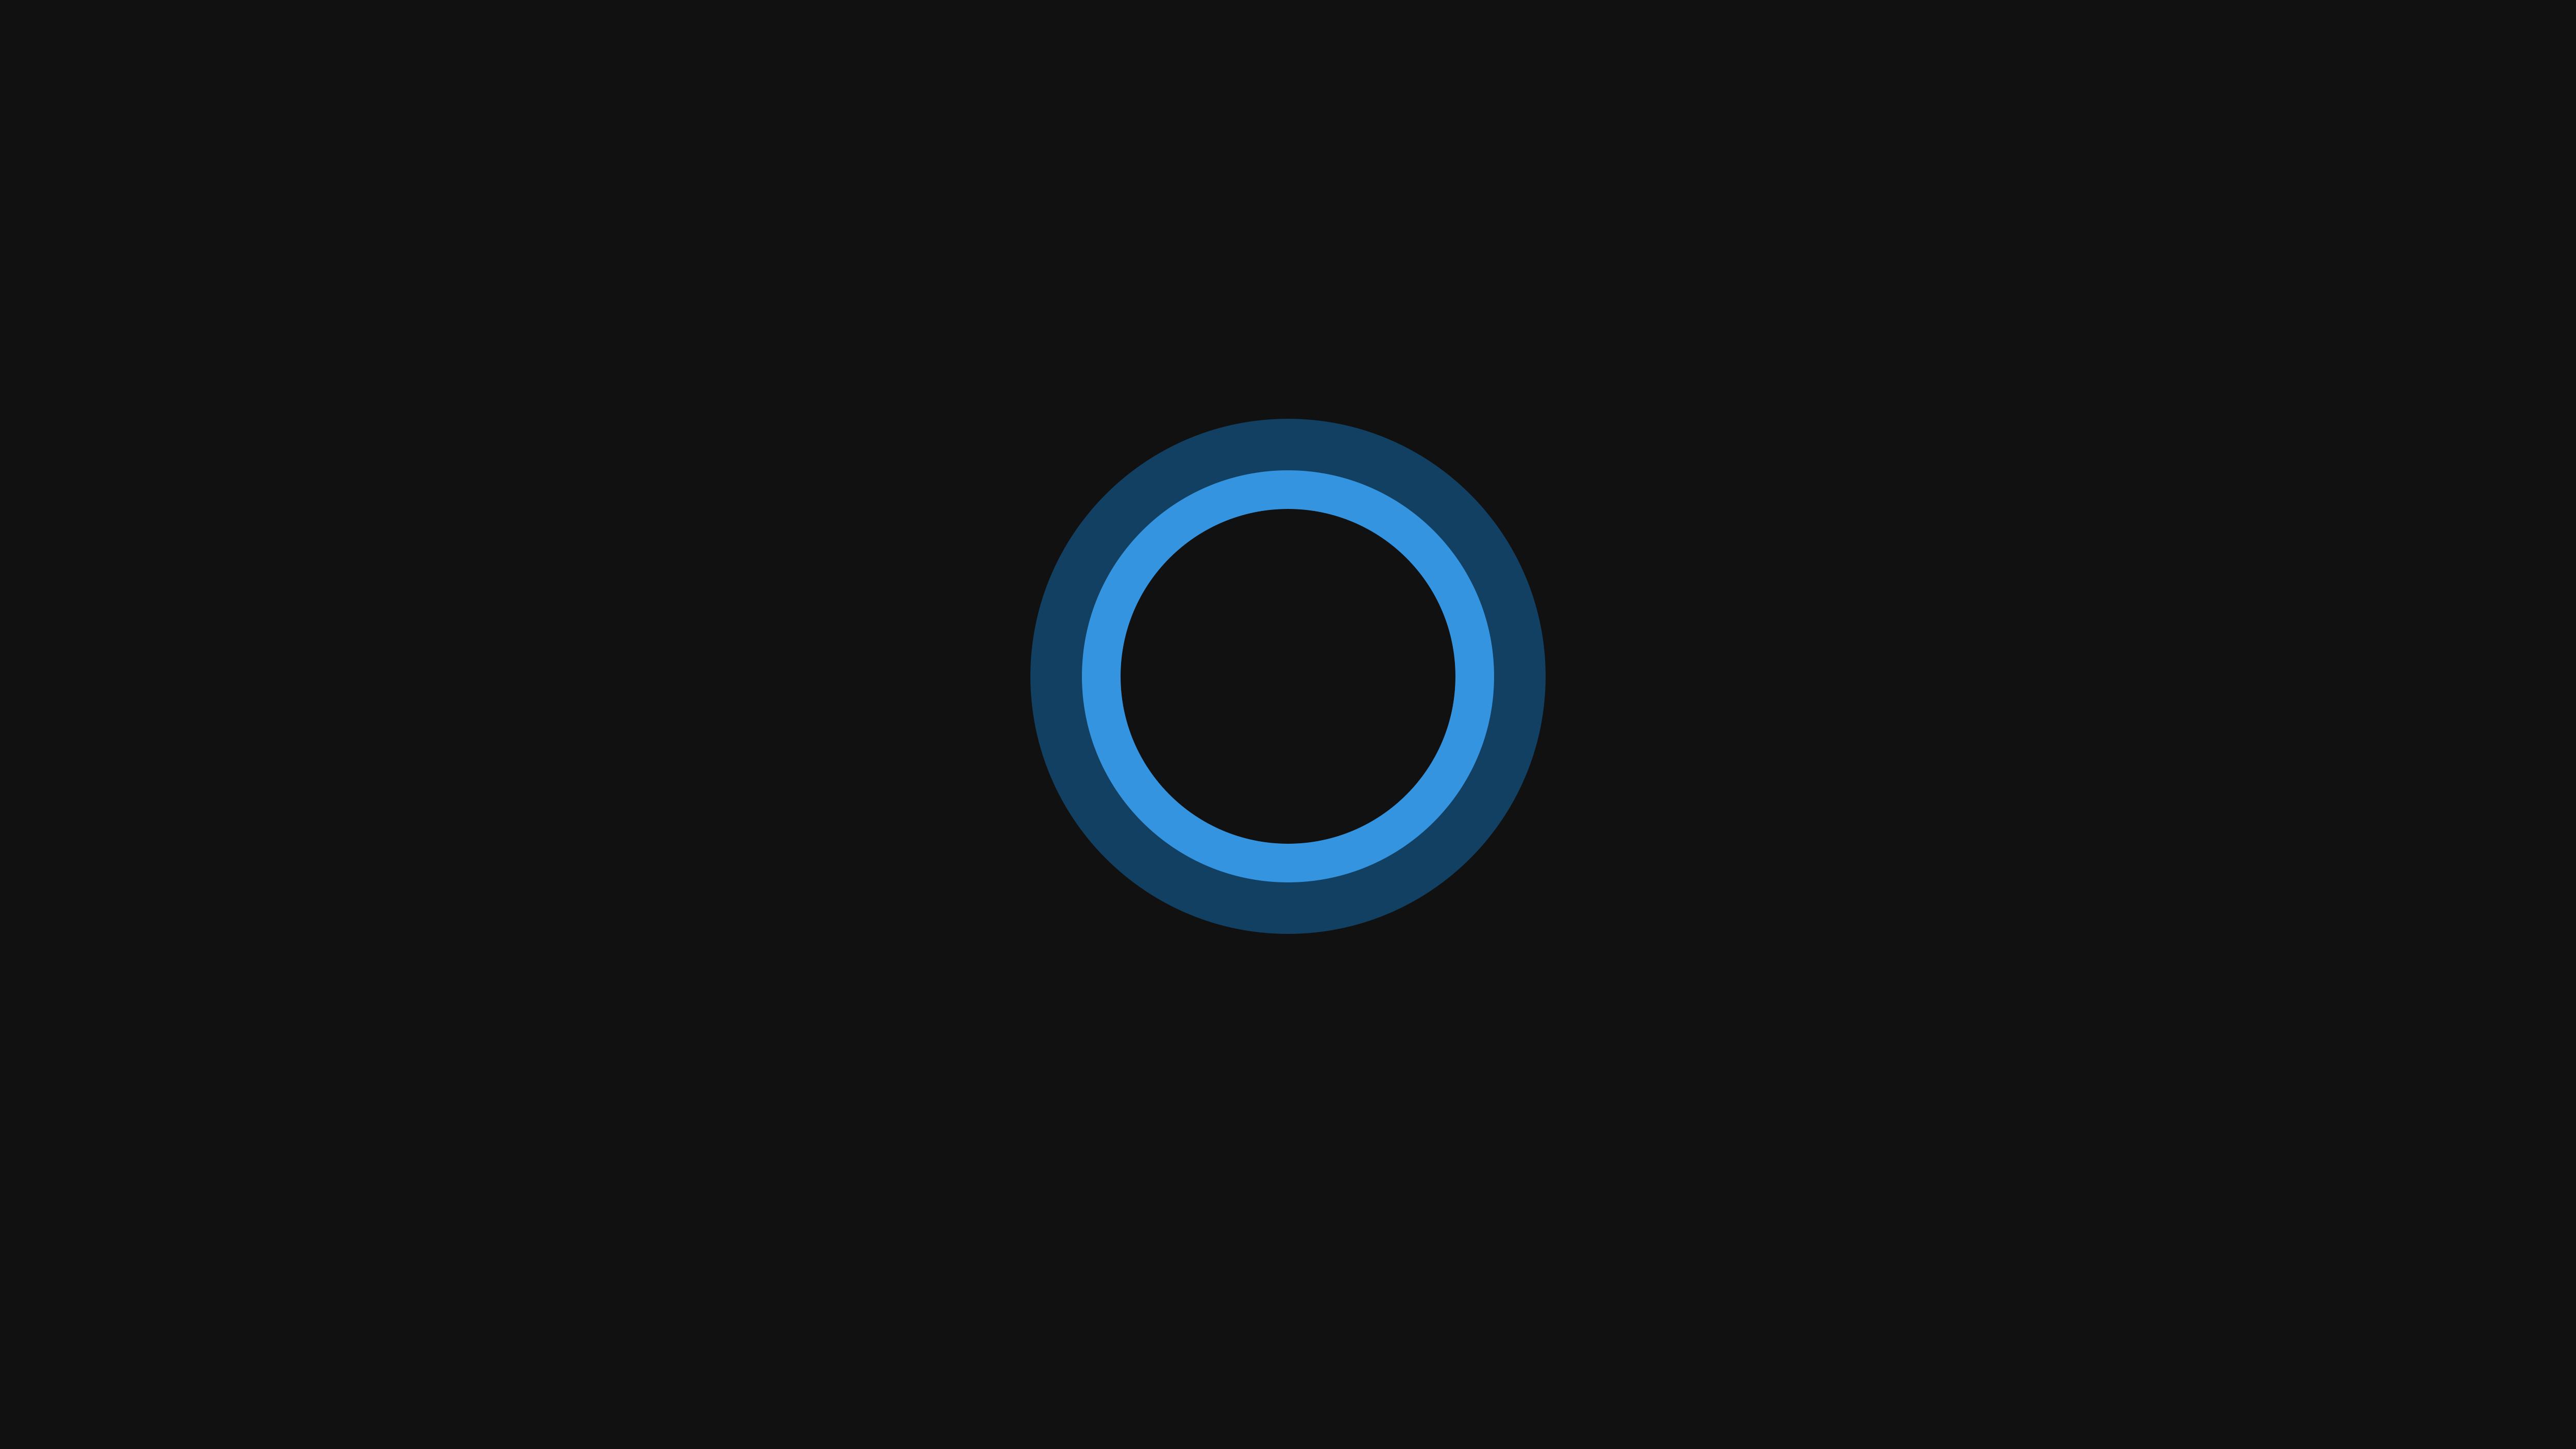 Wallpaper Minimalism Text Logo Circle Windows 10